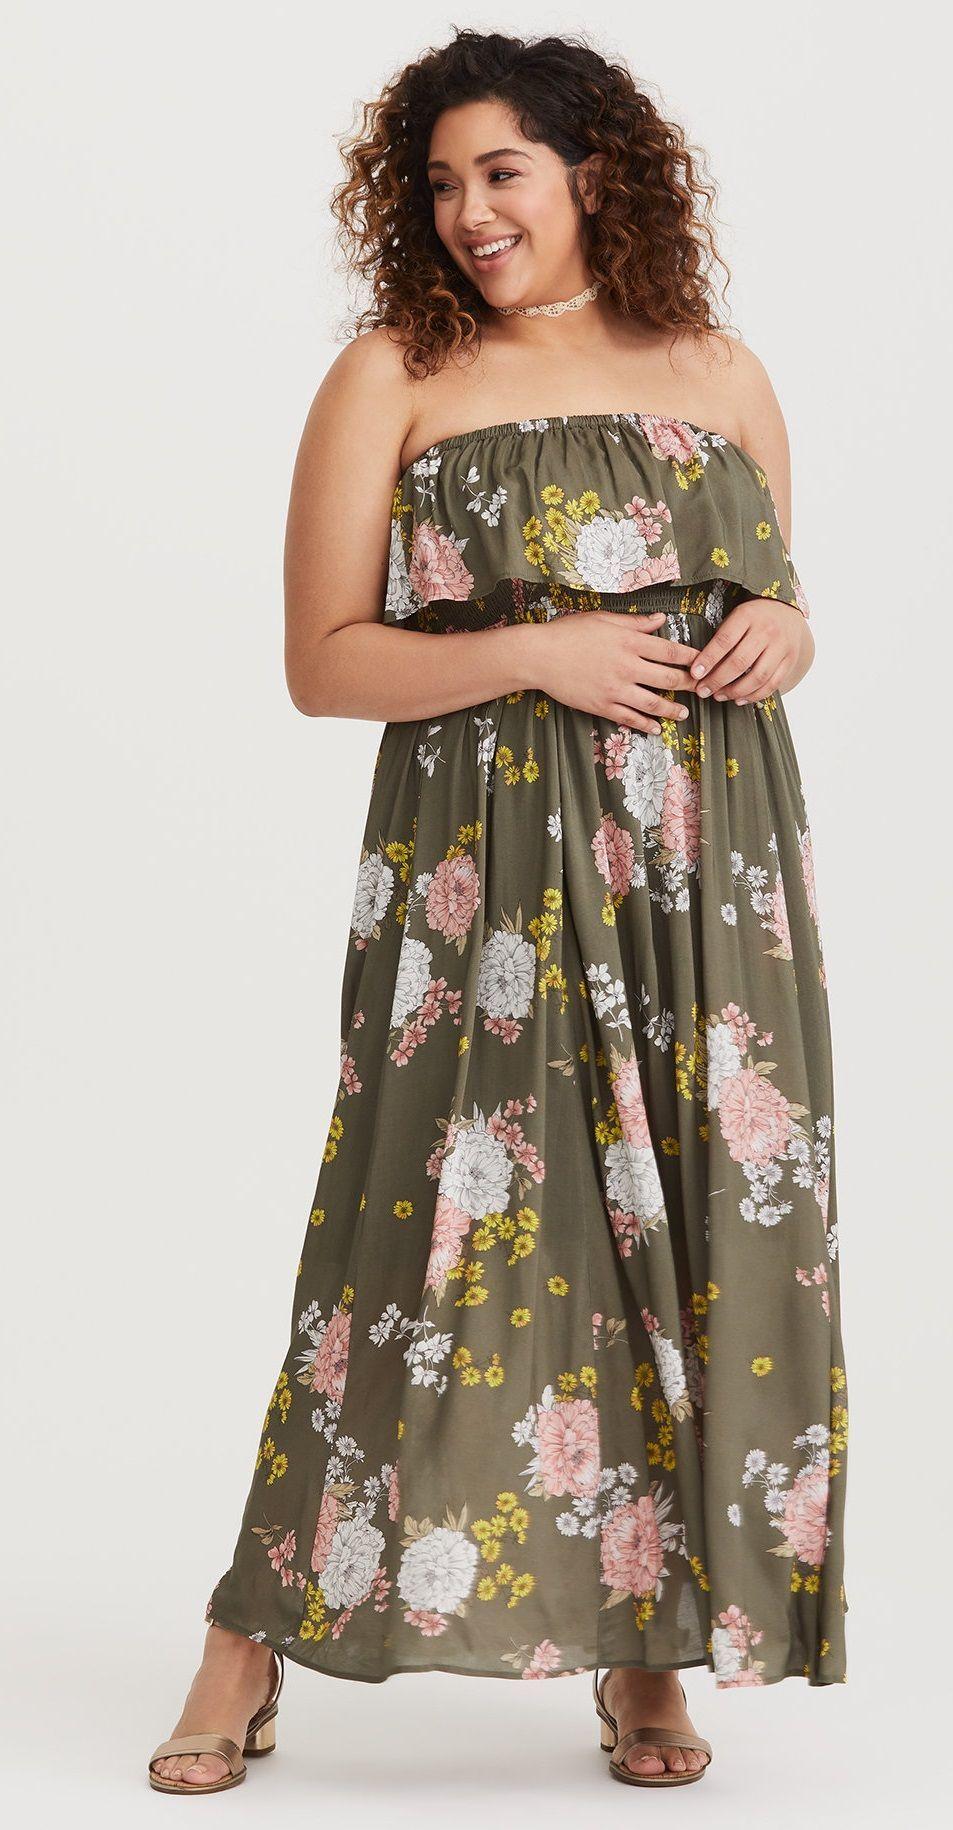 Plus size maxi dress plus size fashion for women plussize